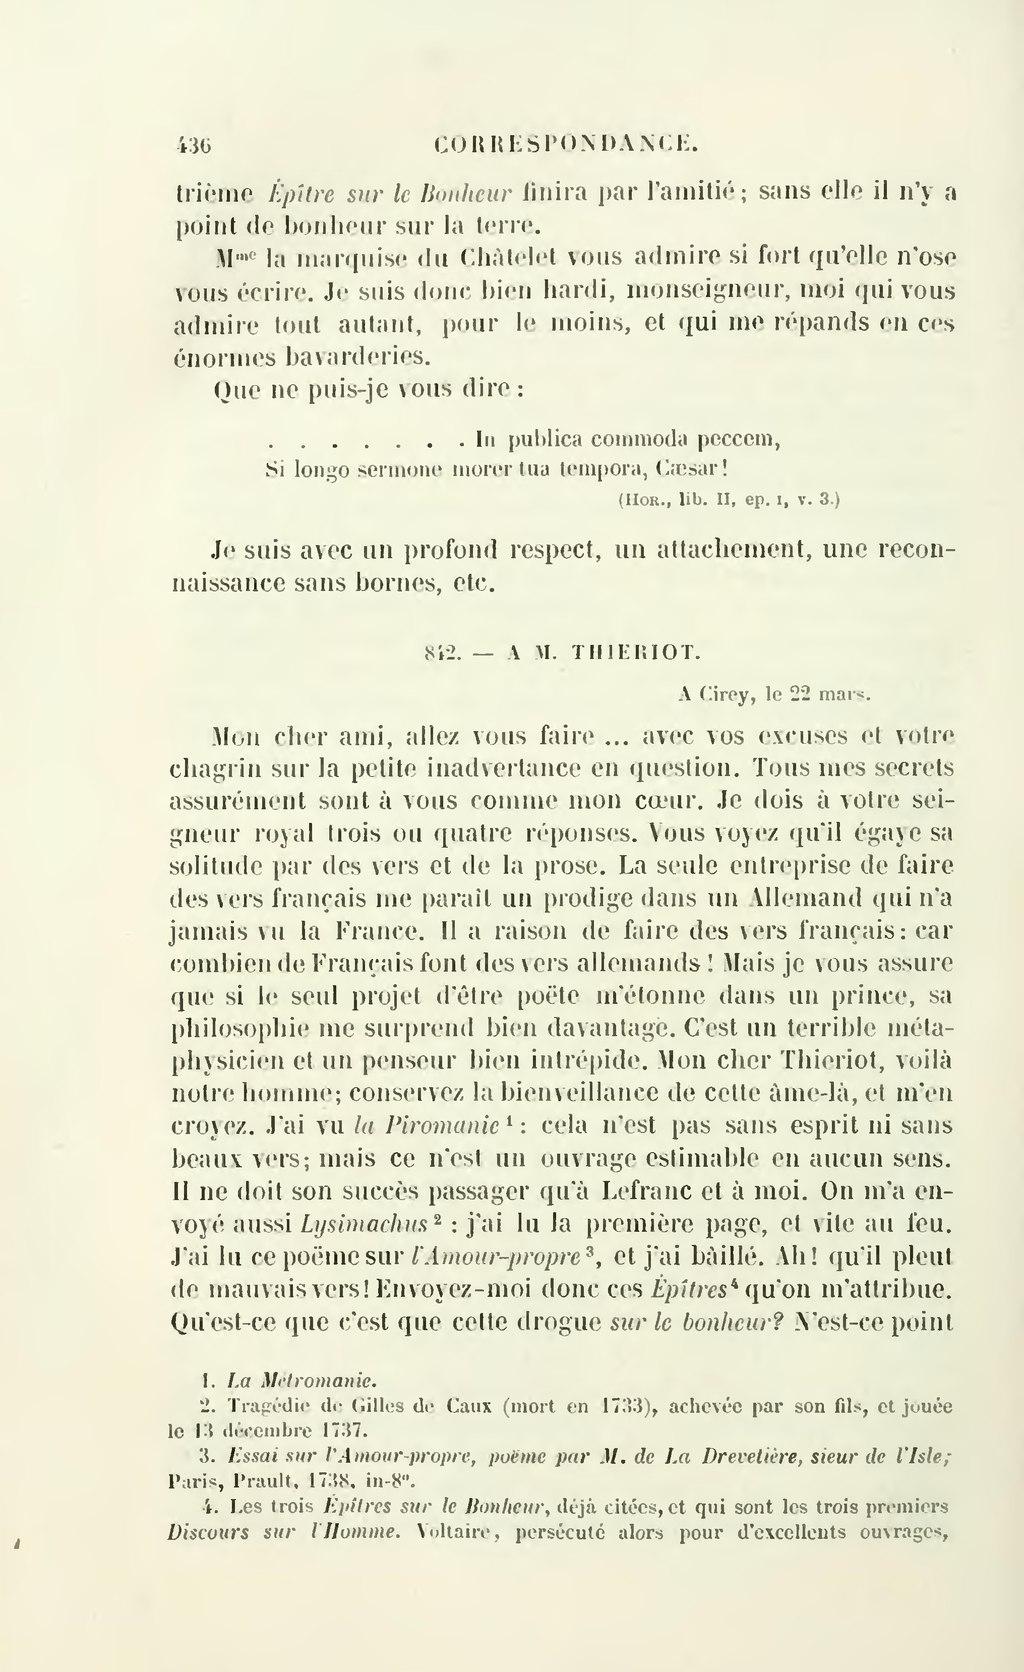 Pagevoltaire œuvres Complètes Garnier Tome34djvu446